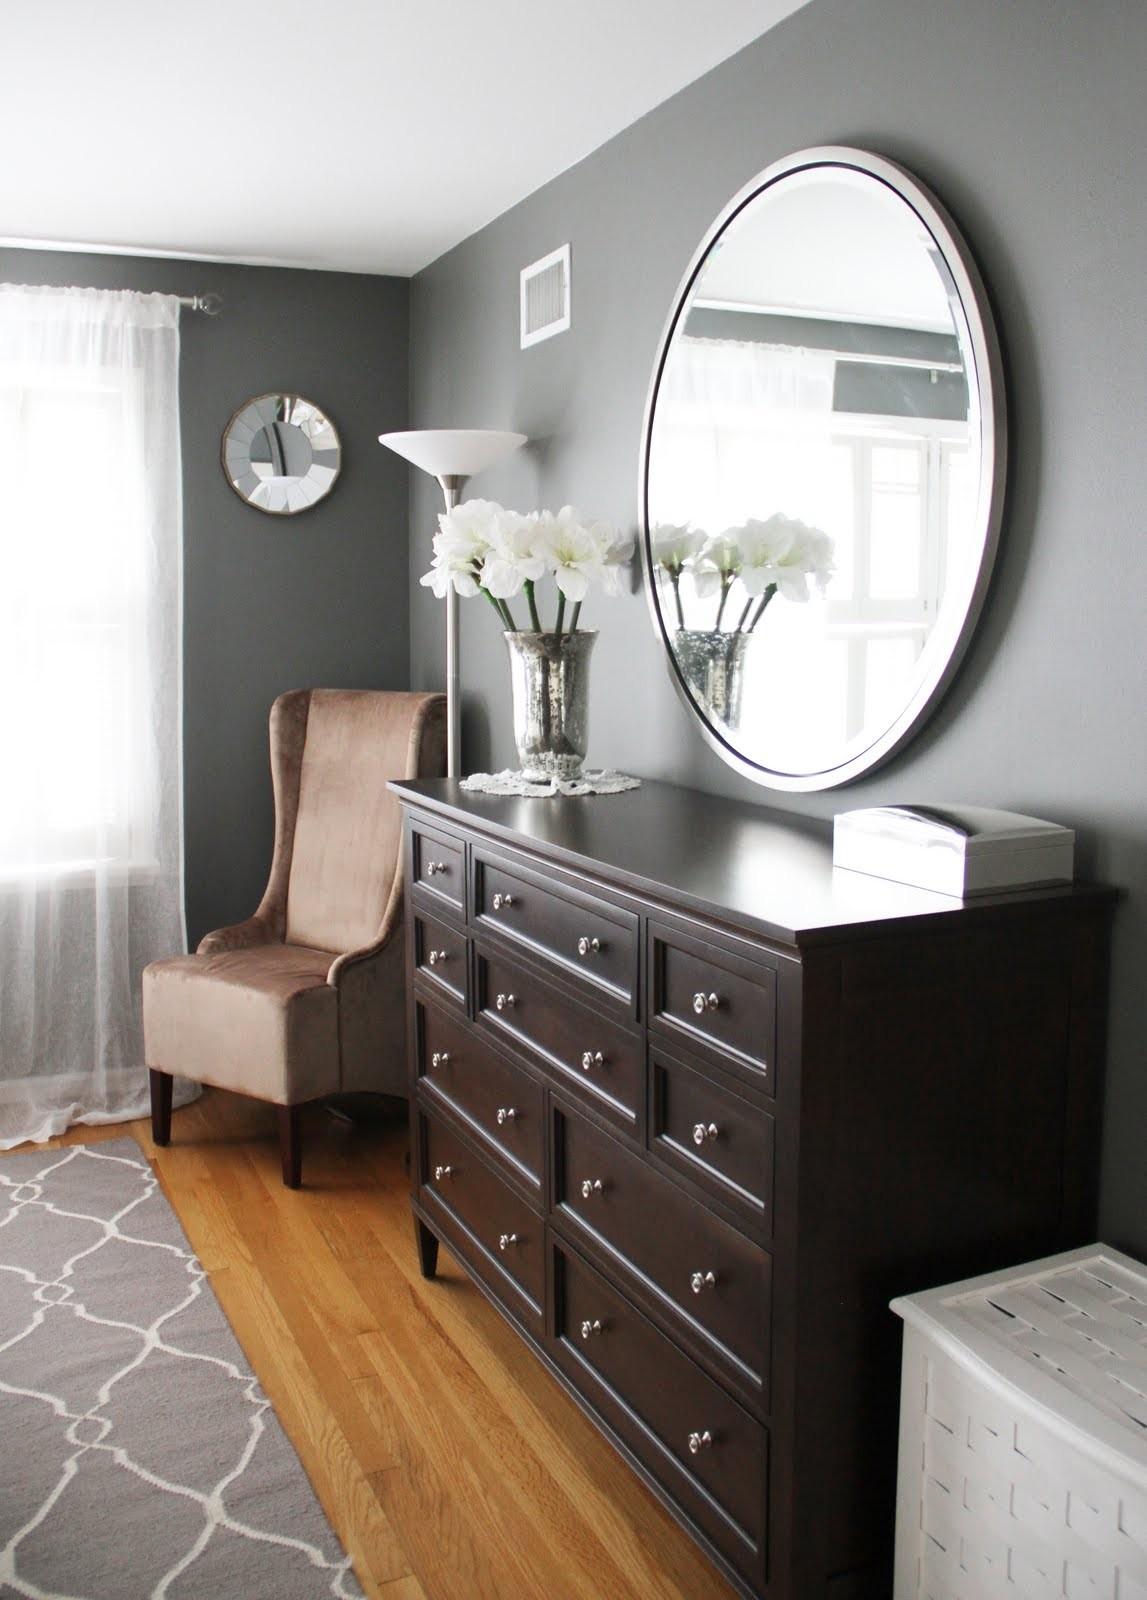 Furniture for bedrooms ideas Bedroom Decorating Brown Bedroom Furniture Decorating Ideas Foter Brown Bedroom Furniture Ideas On Foter